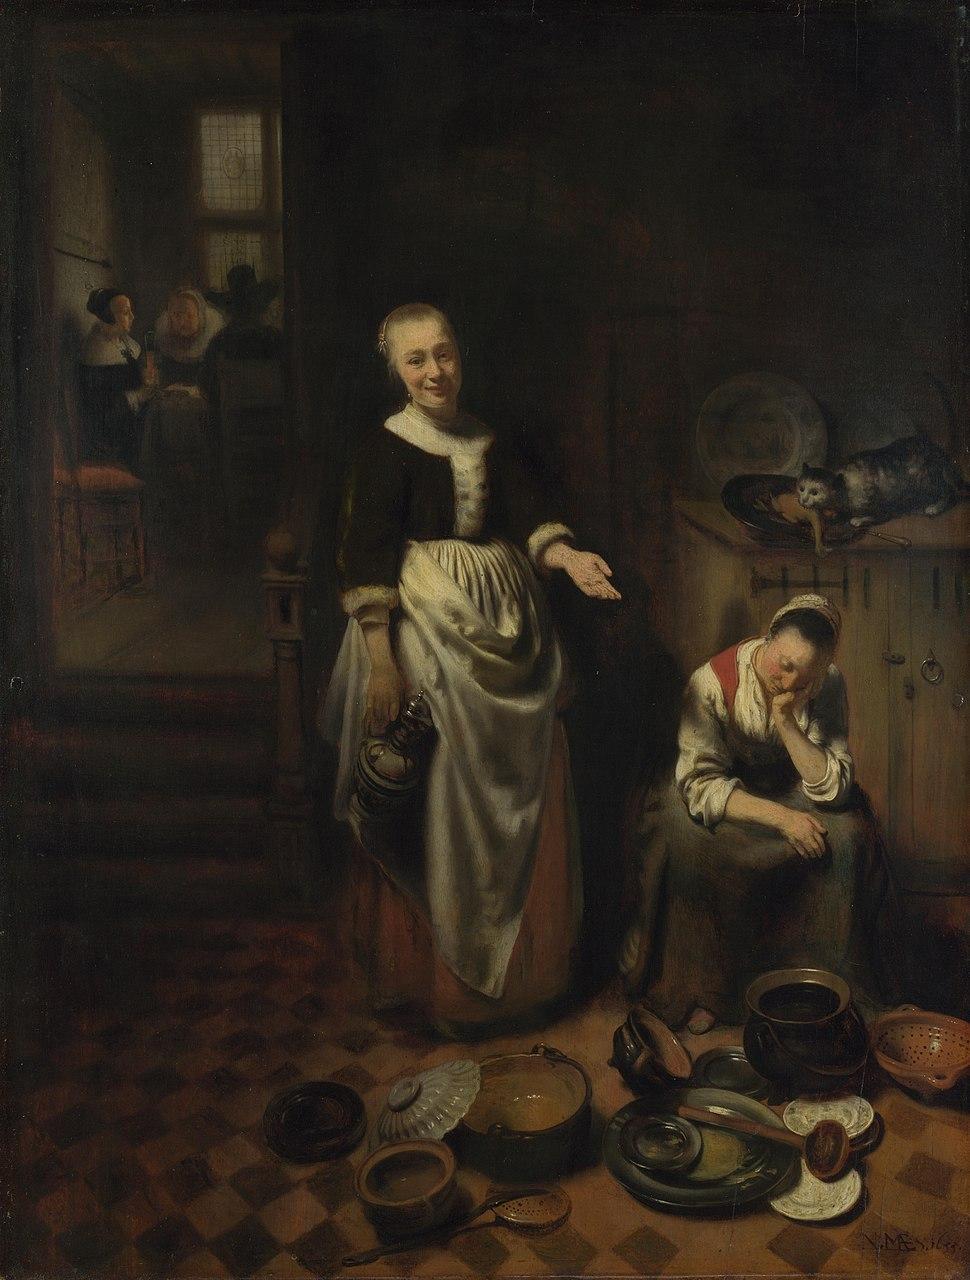 The idle servant